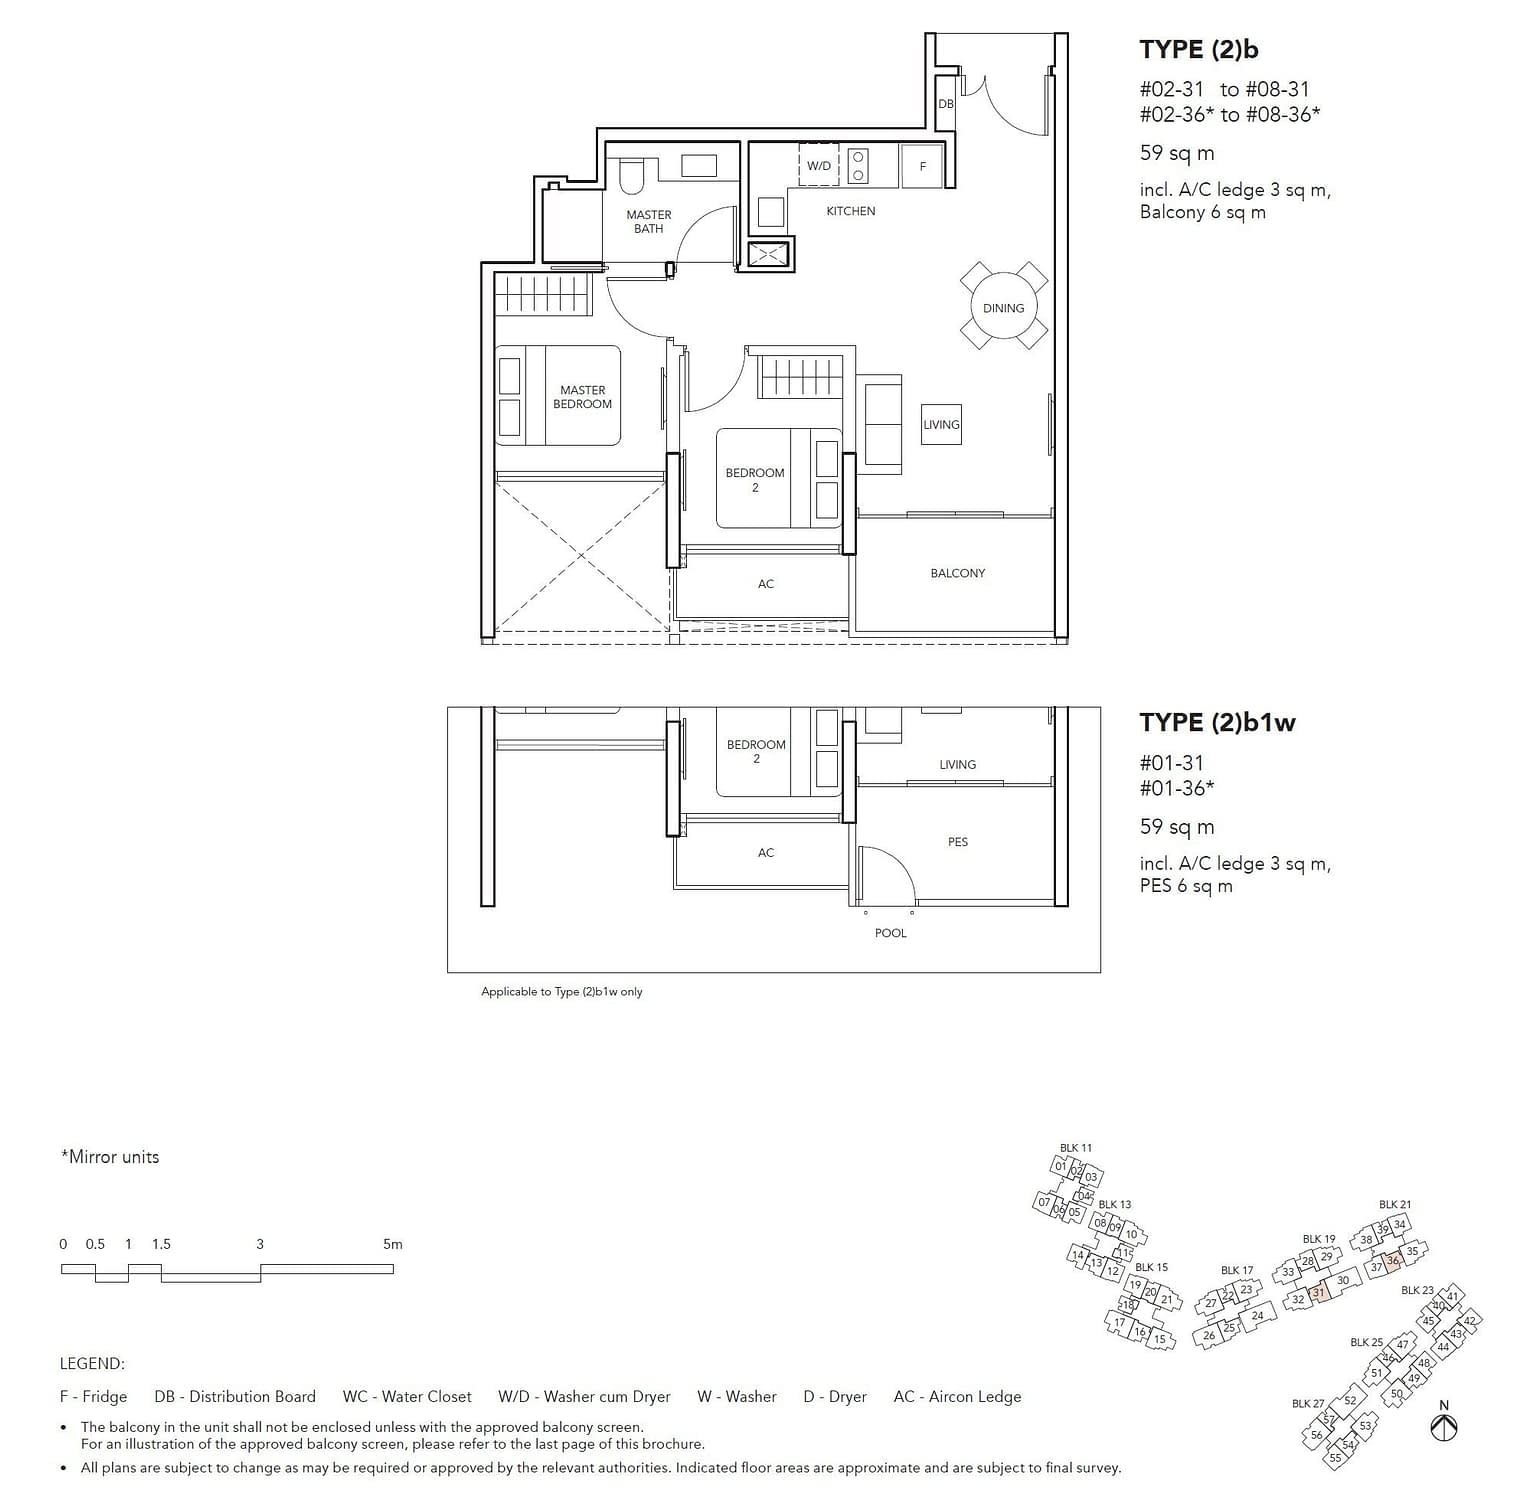 Jovell Jovell Floorplan 2b1w